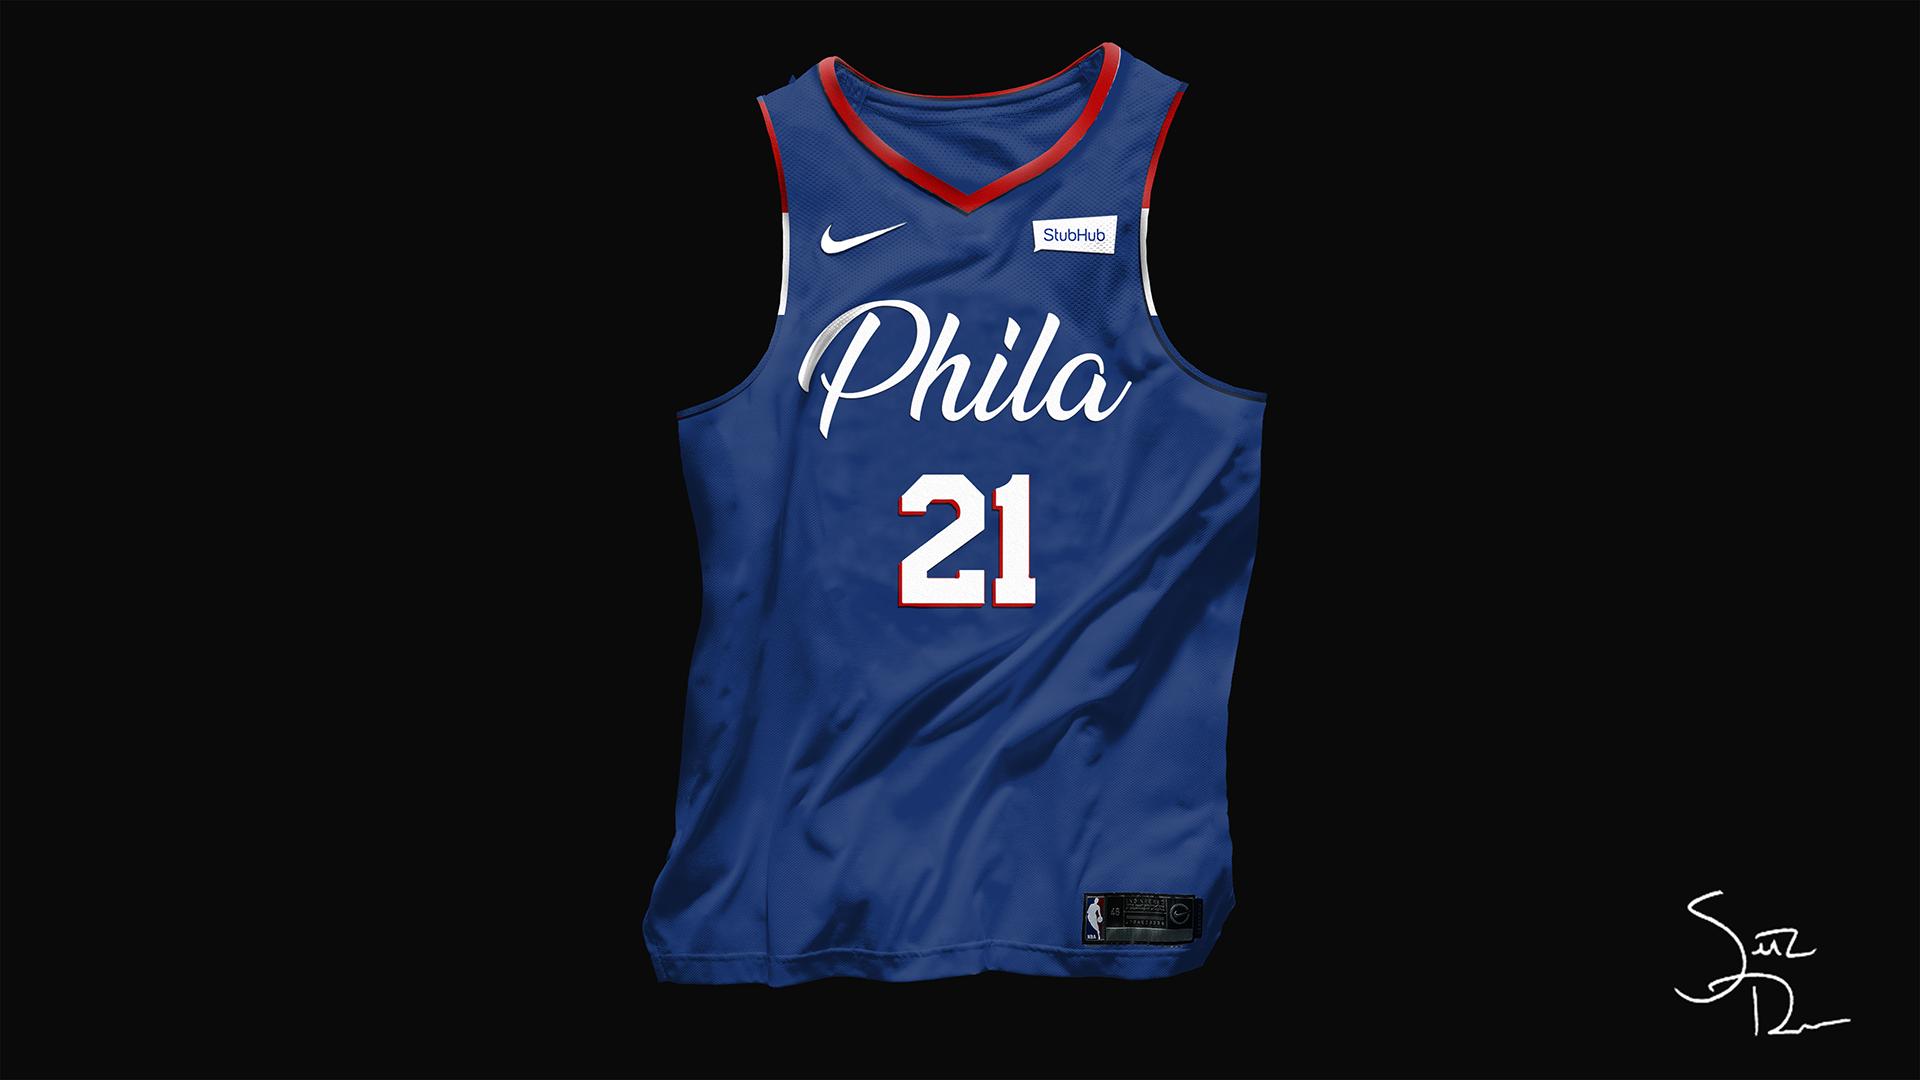 76ers Nike x NBA Concept on Behance Bola basket